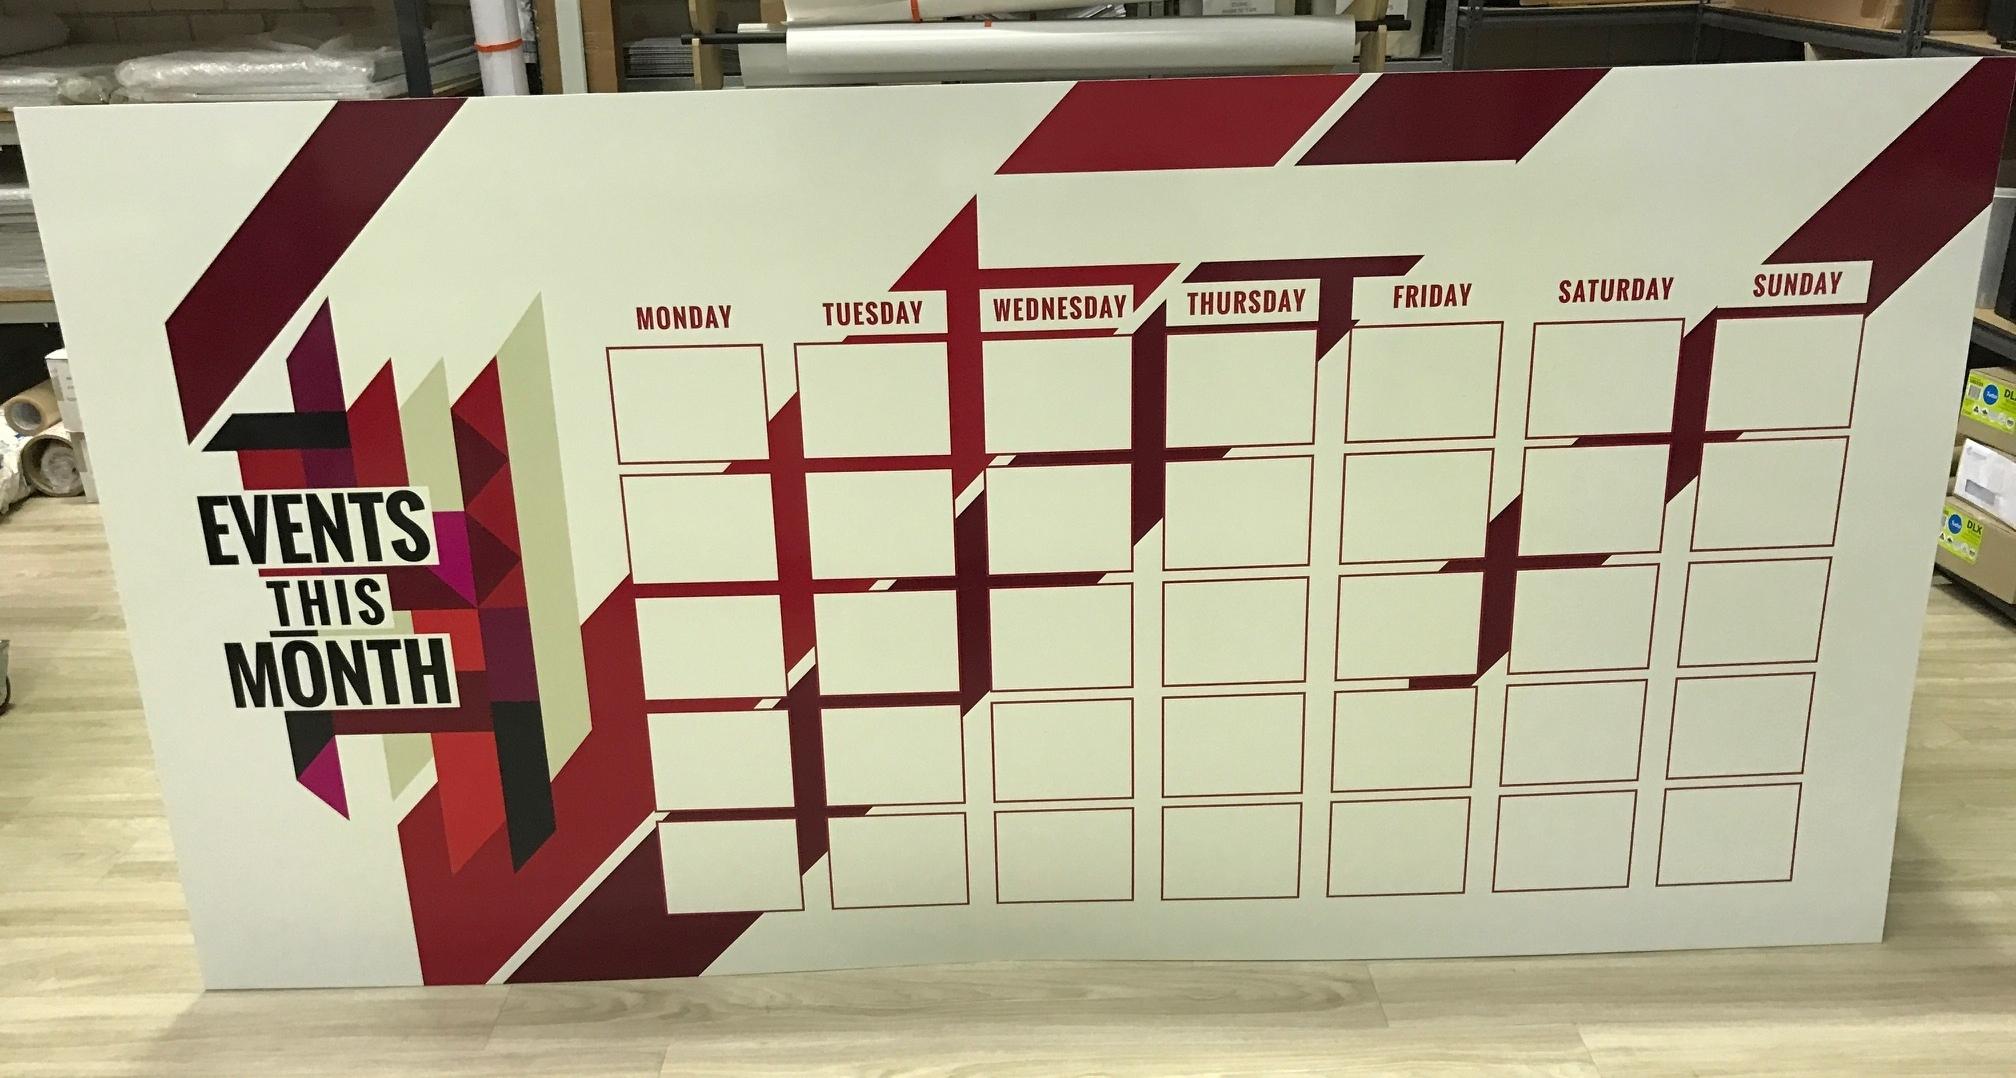 Event planner whiteboard